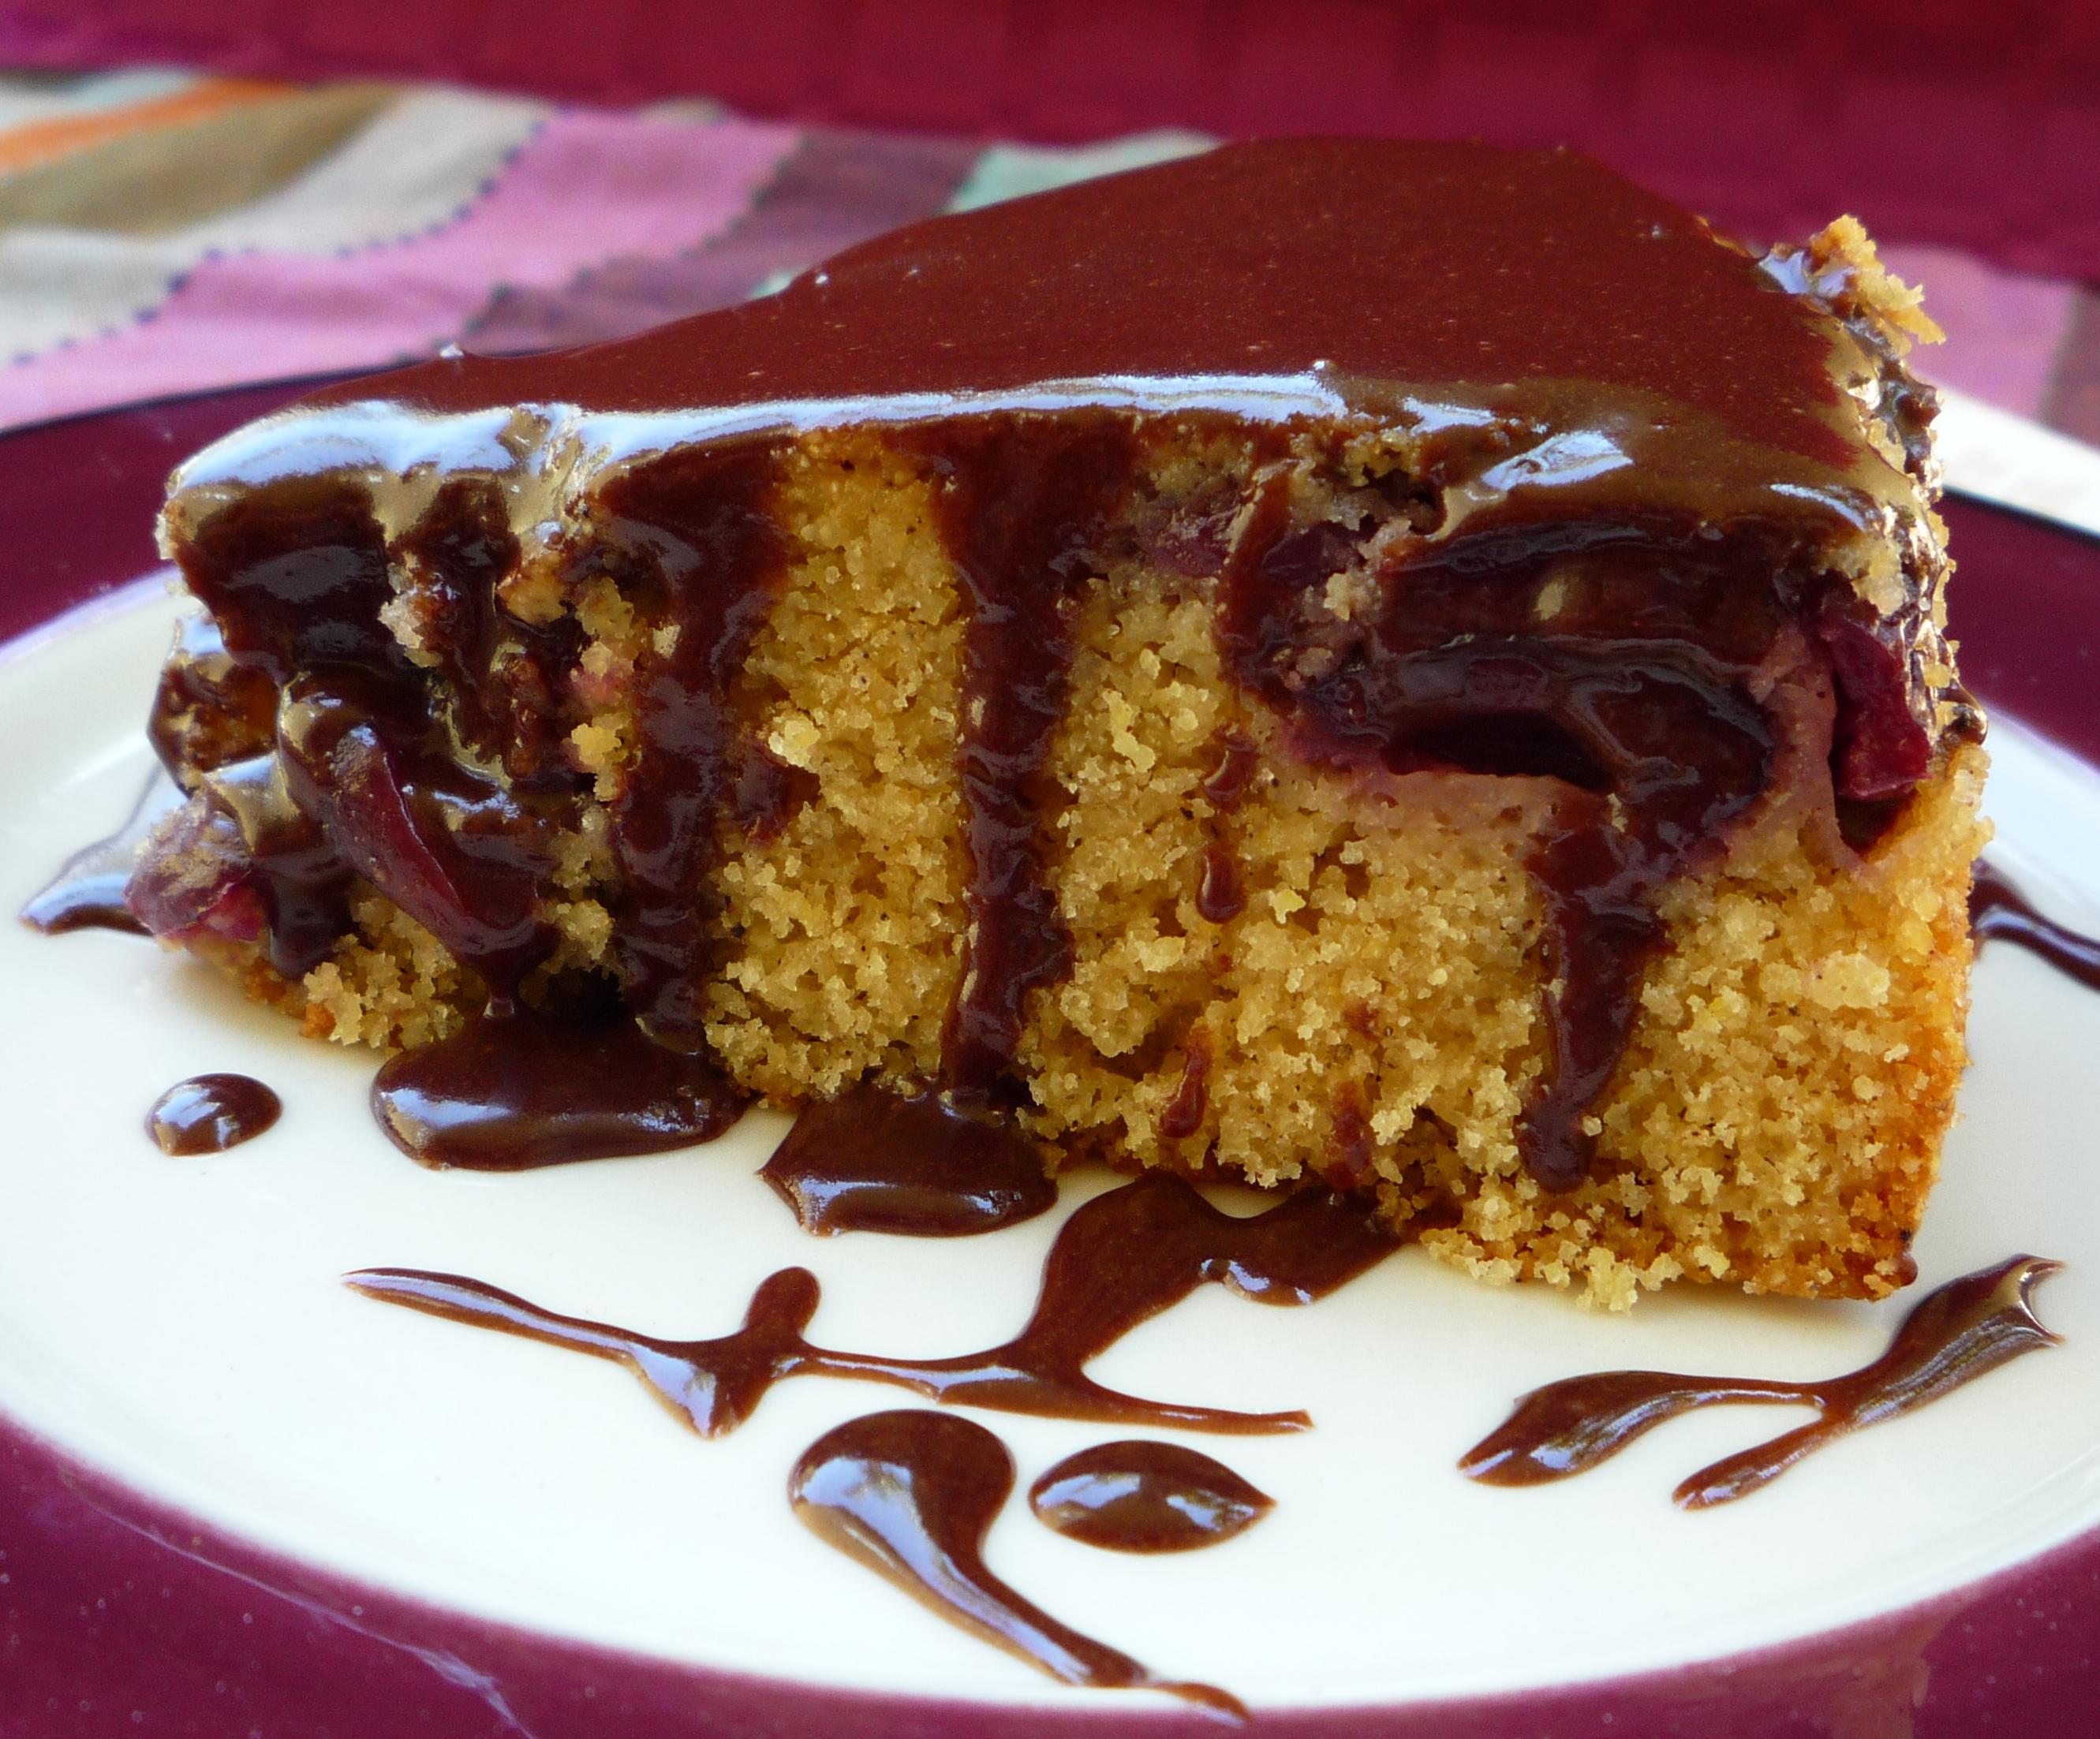 Cherry Cornmeal Cake with Chocolate Glaze | * NerdyBaker